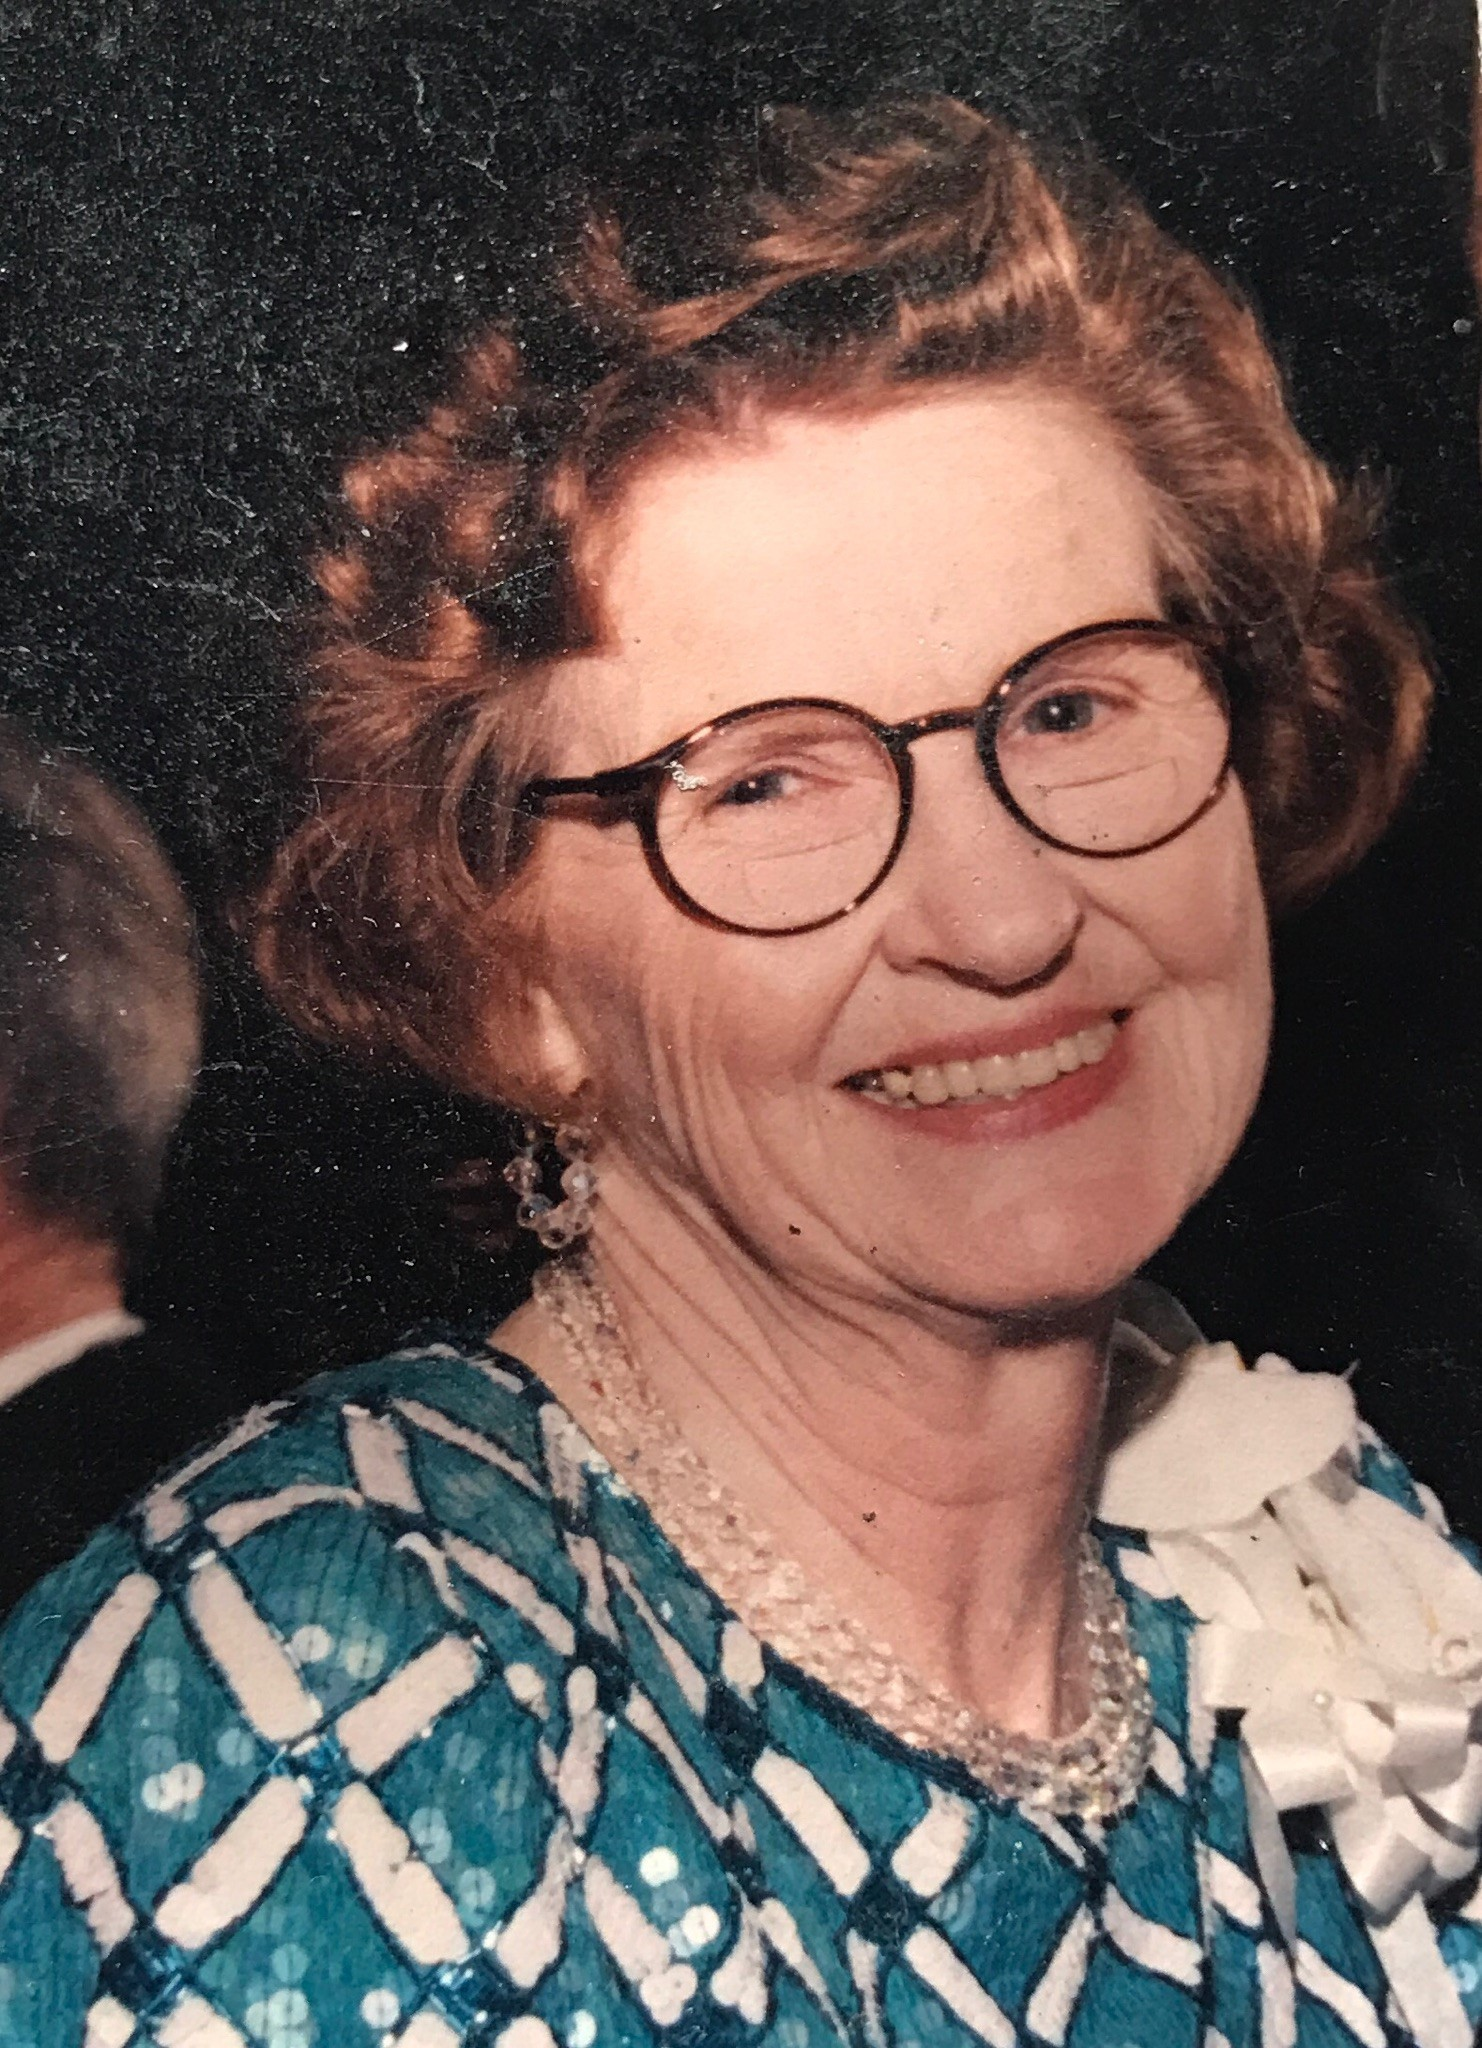 Sarah Orr Allen